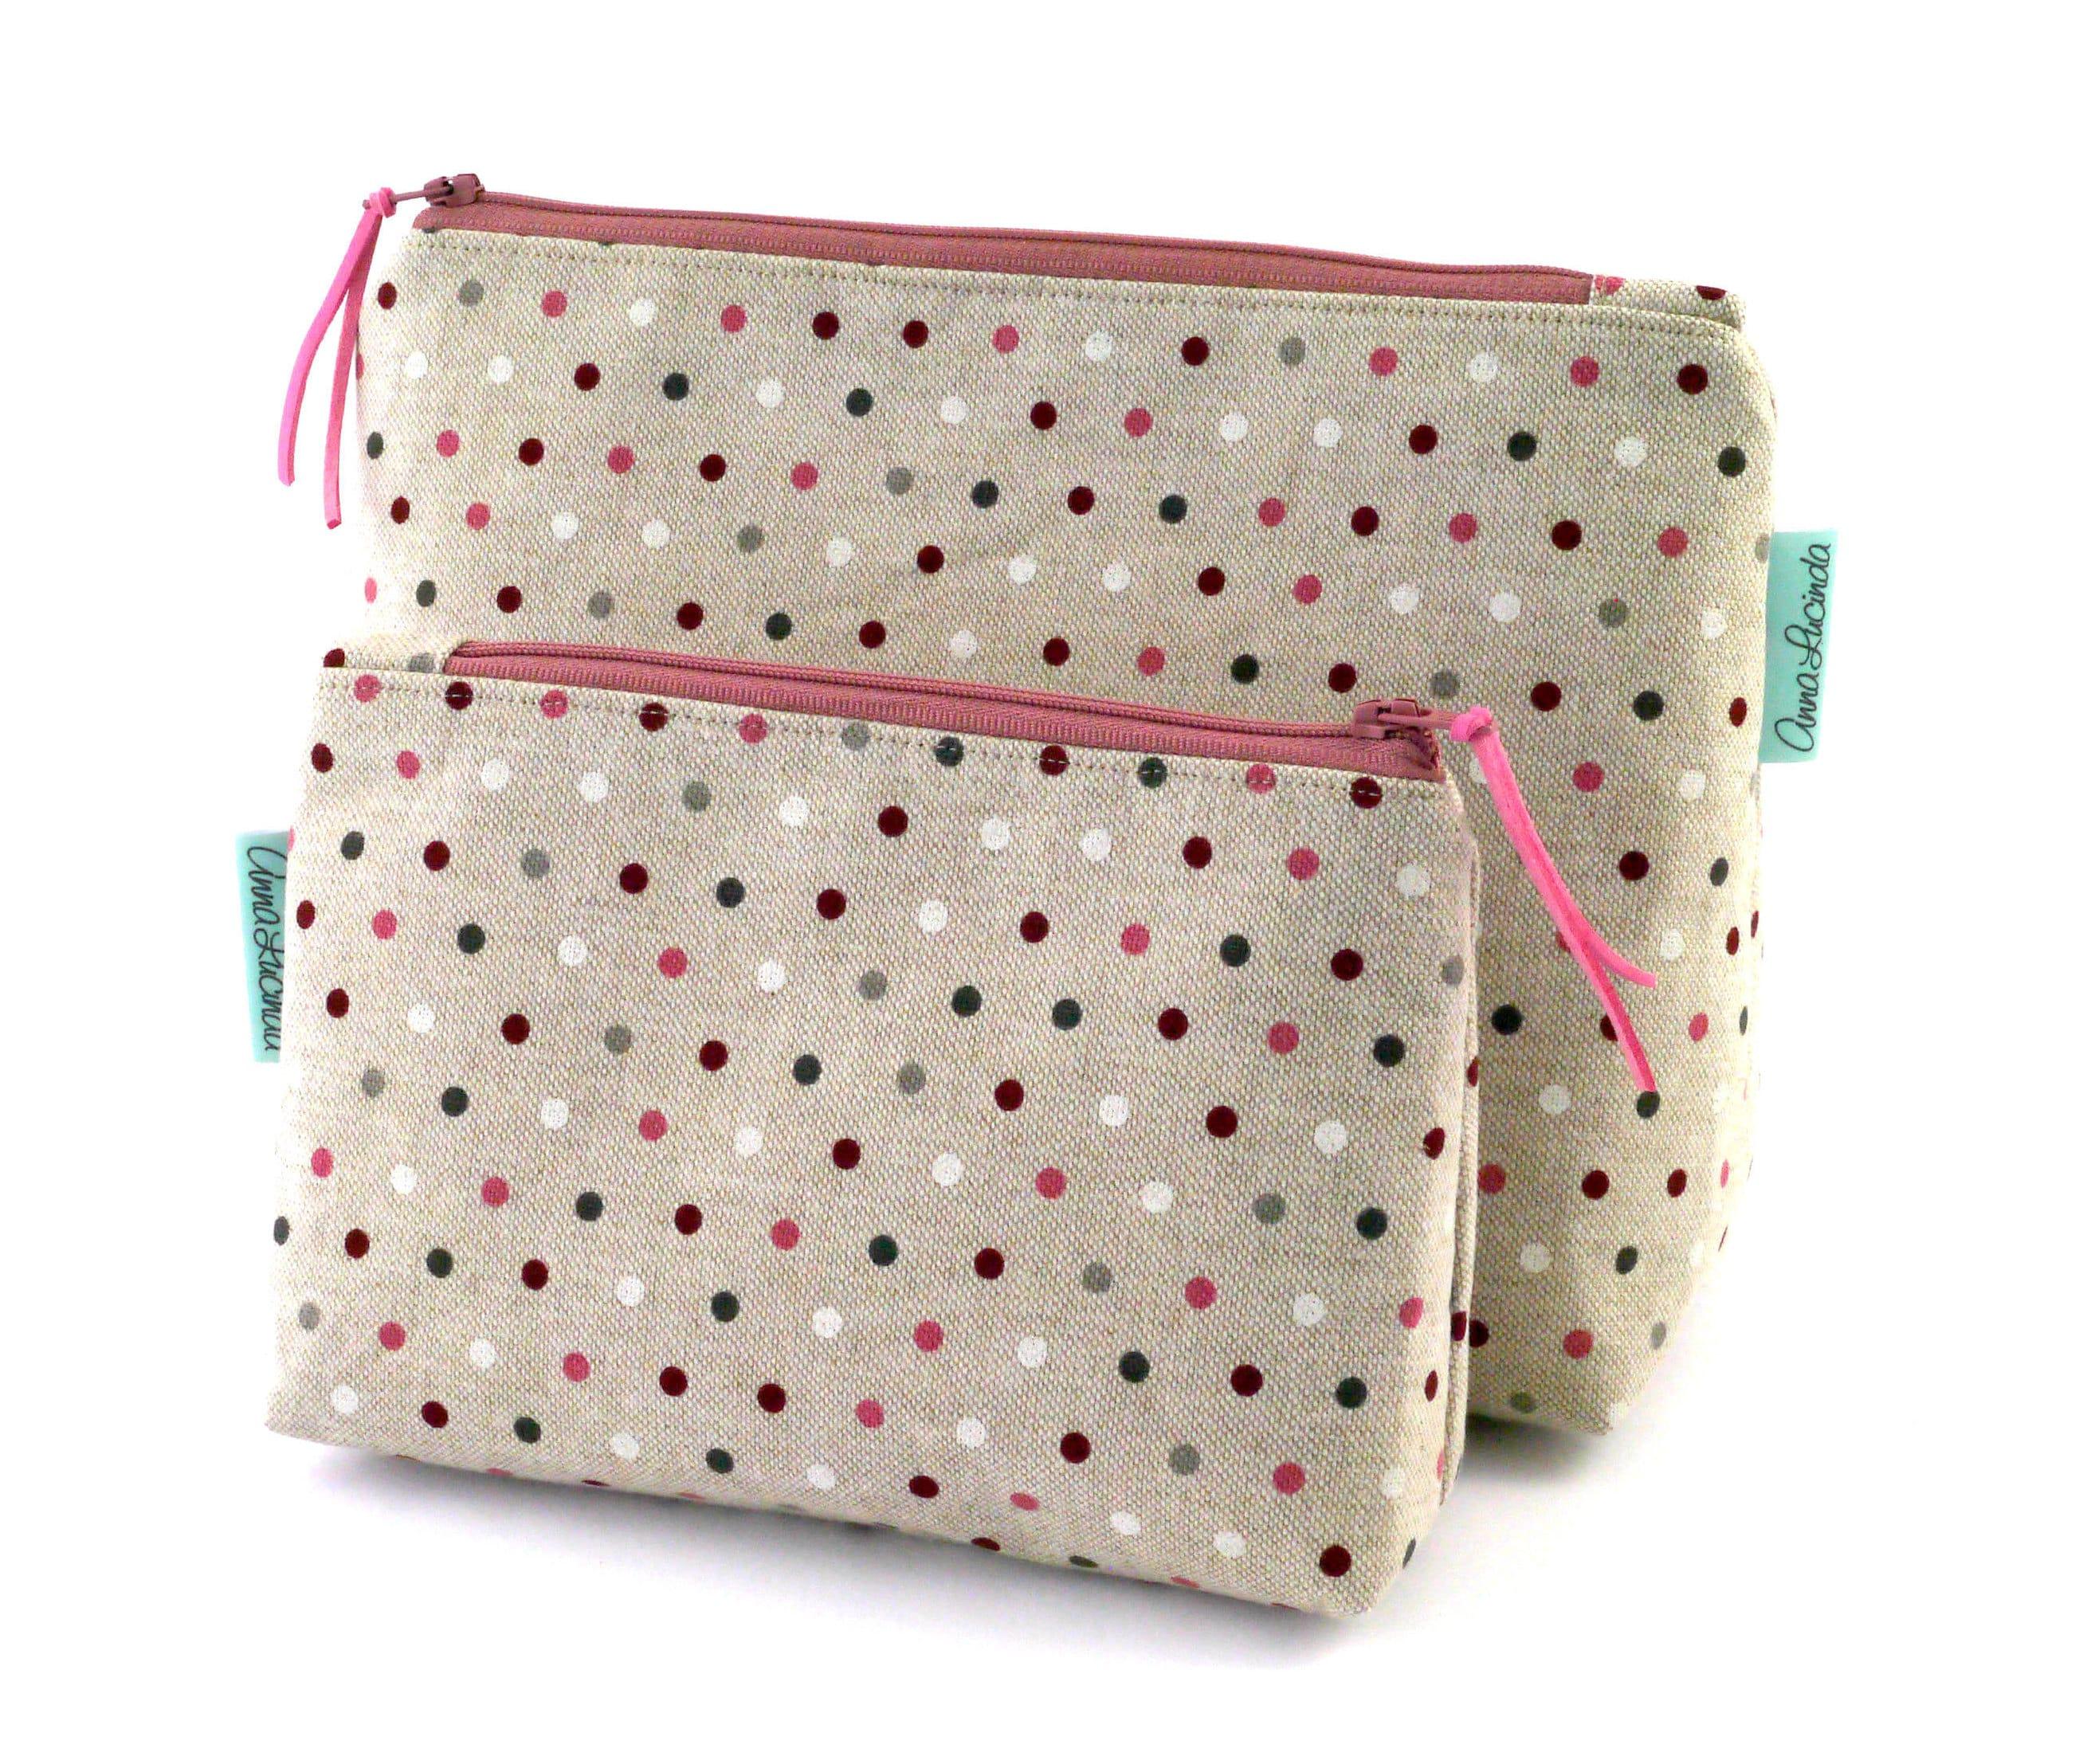 b70431fe2f8f Zipper bag Wash bag Polka dot cosmetic bag Linen Look Pouch